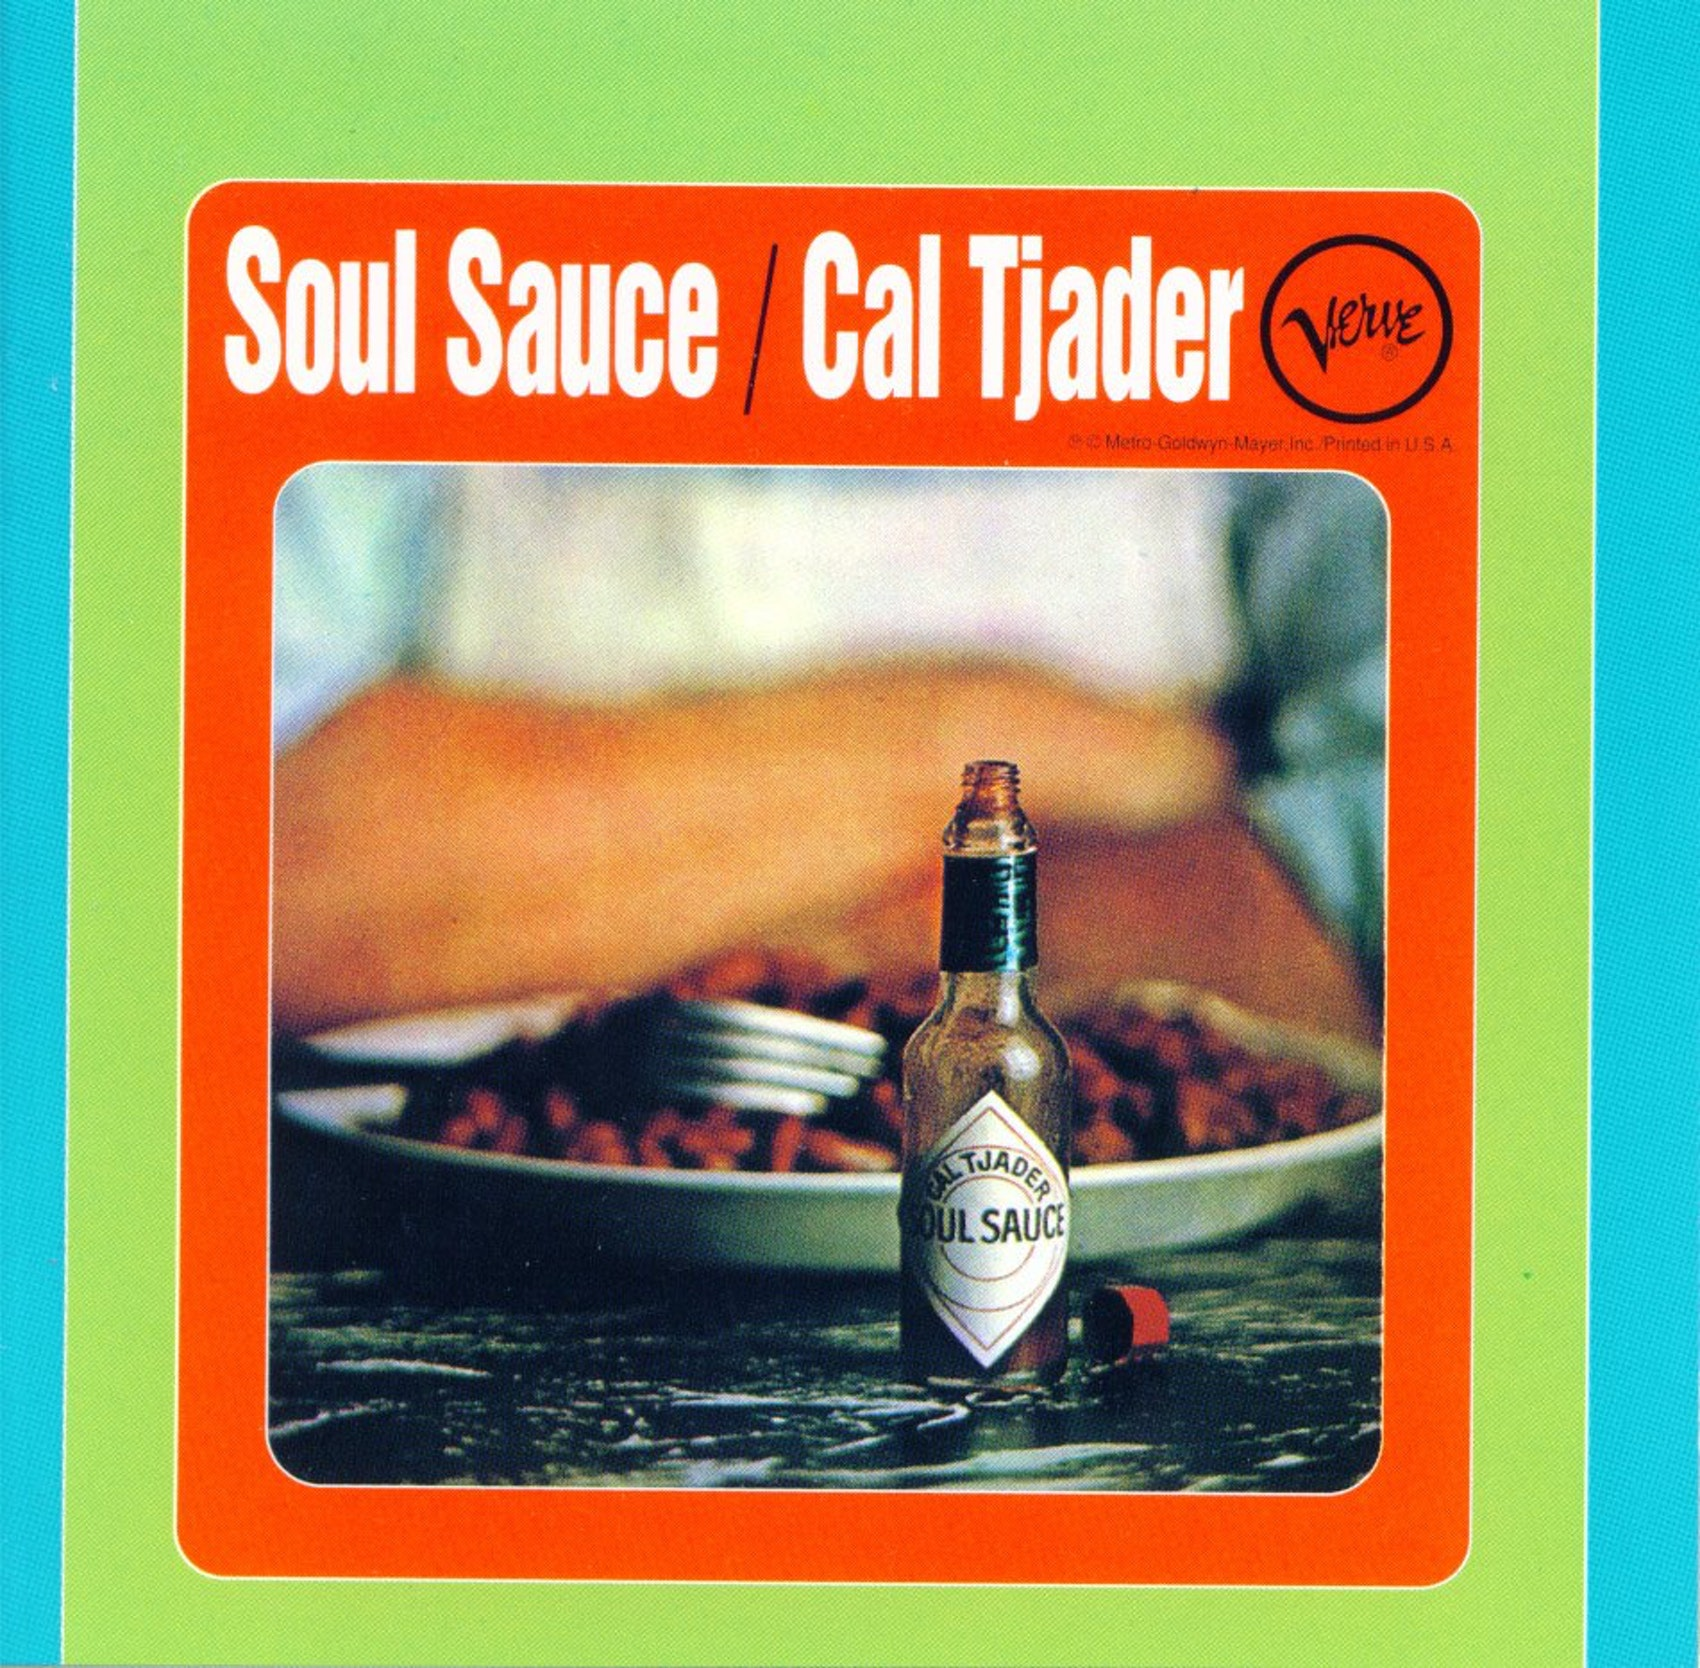 The 10 Best Latin Jazz Albums To Own On Vinyl — Vinyl Me, Please